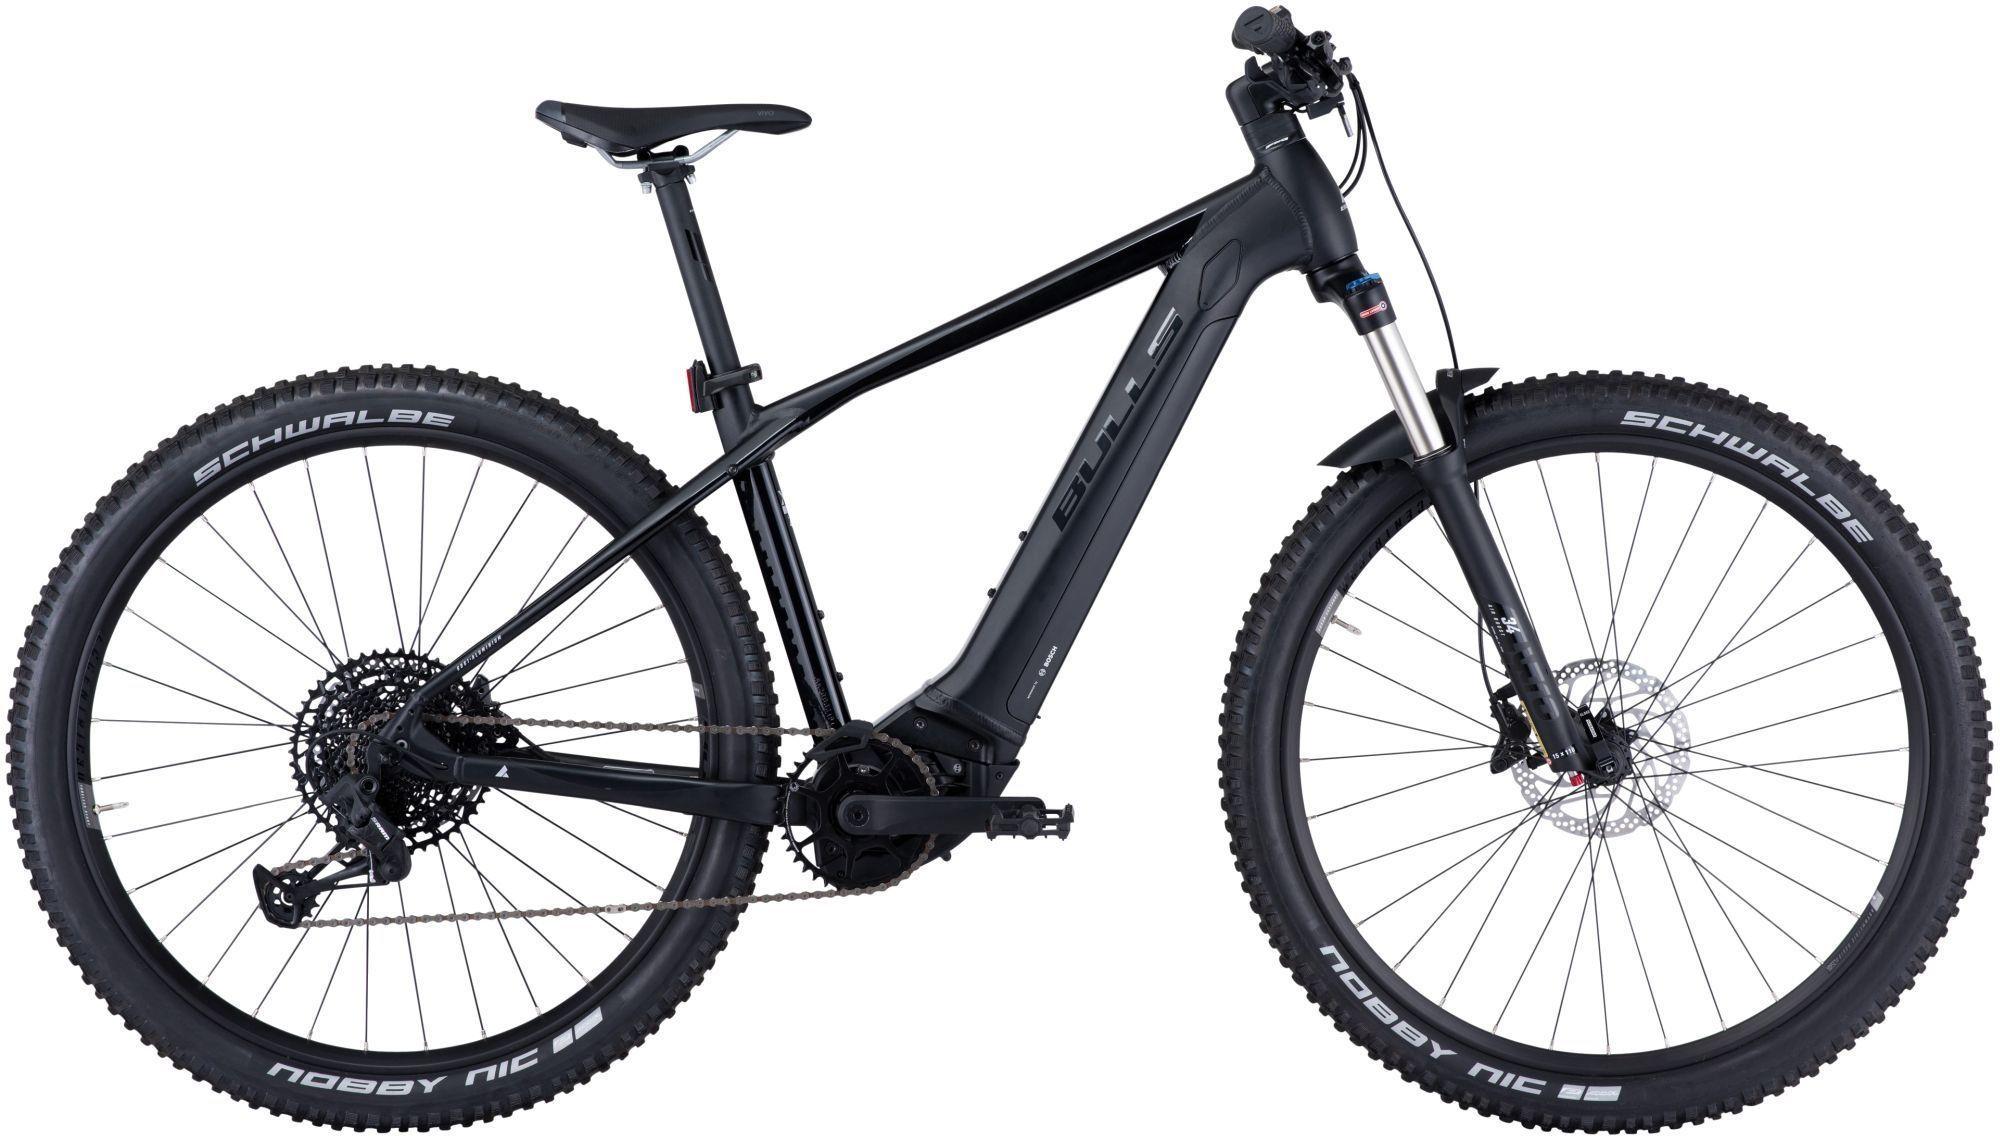 e-Fahrräder/E-Mountainbikes: Diamant BULLS Copperhead EVO 3 275+(500 Wh) 12 Gang Kettenschaltung Herrenfahrrad Diamant Modell 2021 275+ Zoll 48 cm  matt